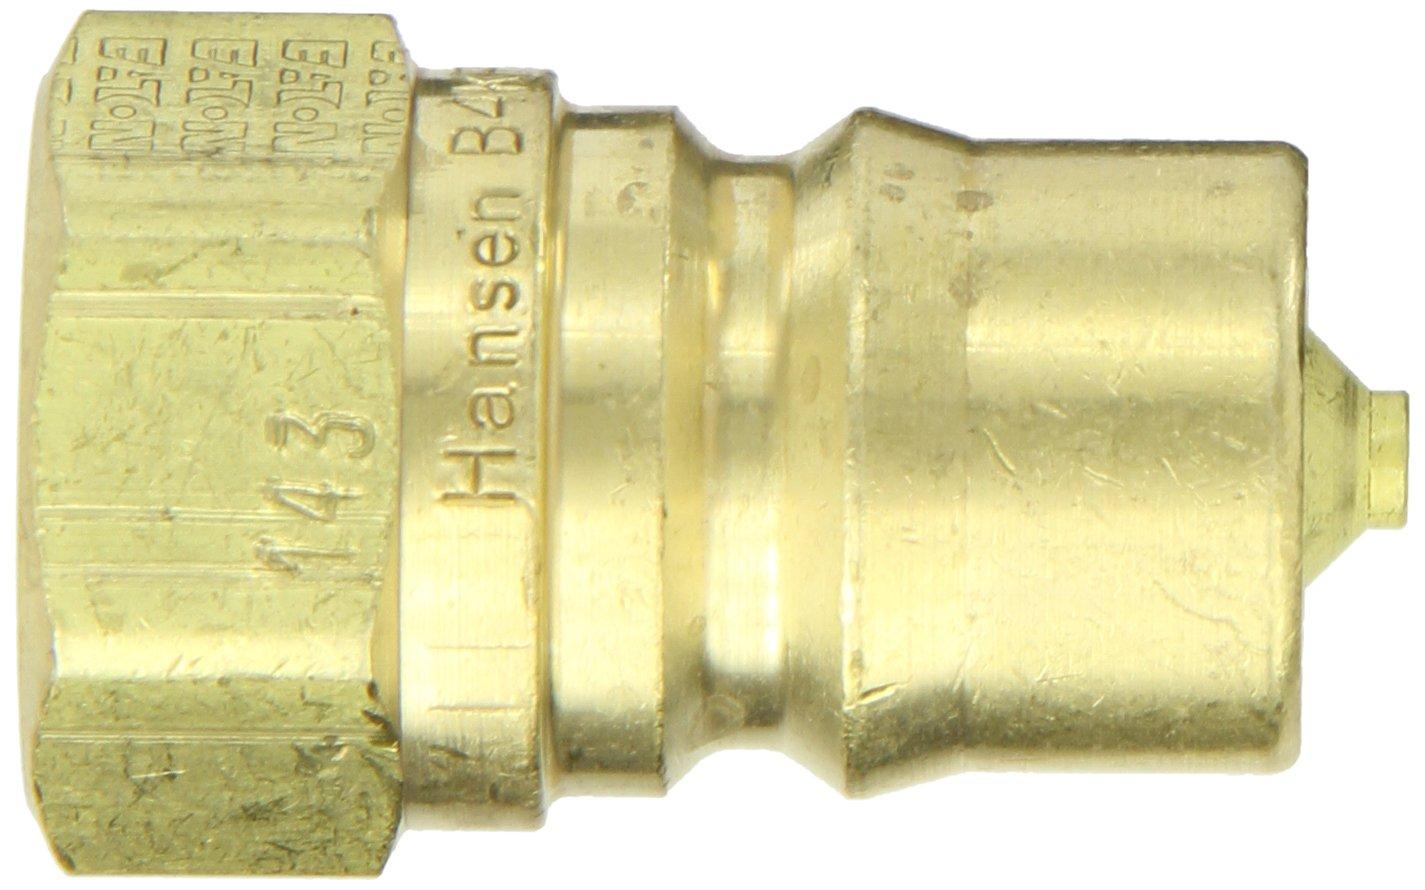 1//2 Body 1//2-14 NPTF Female Fluorocarbon Seal 1//2-14 NPTF Female 1//2 Body Eaton Hansen B4KP26143 Brass ISO-B Interchange Hydraulic Fitting Plug with Valve